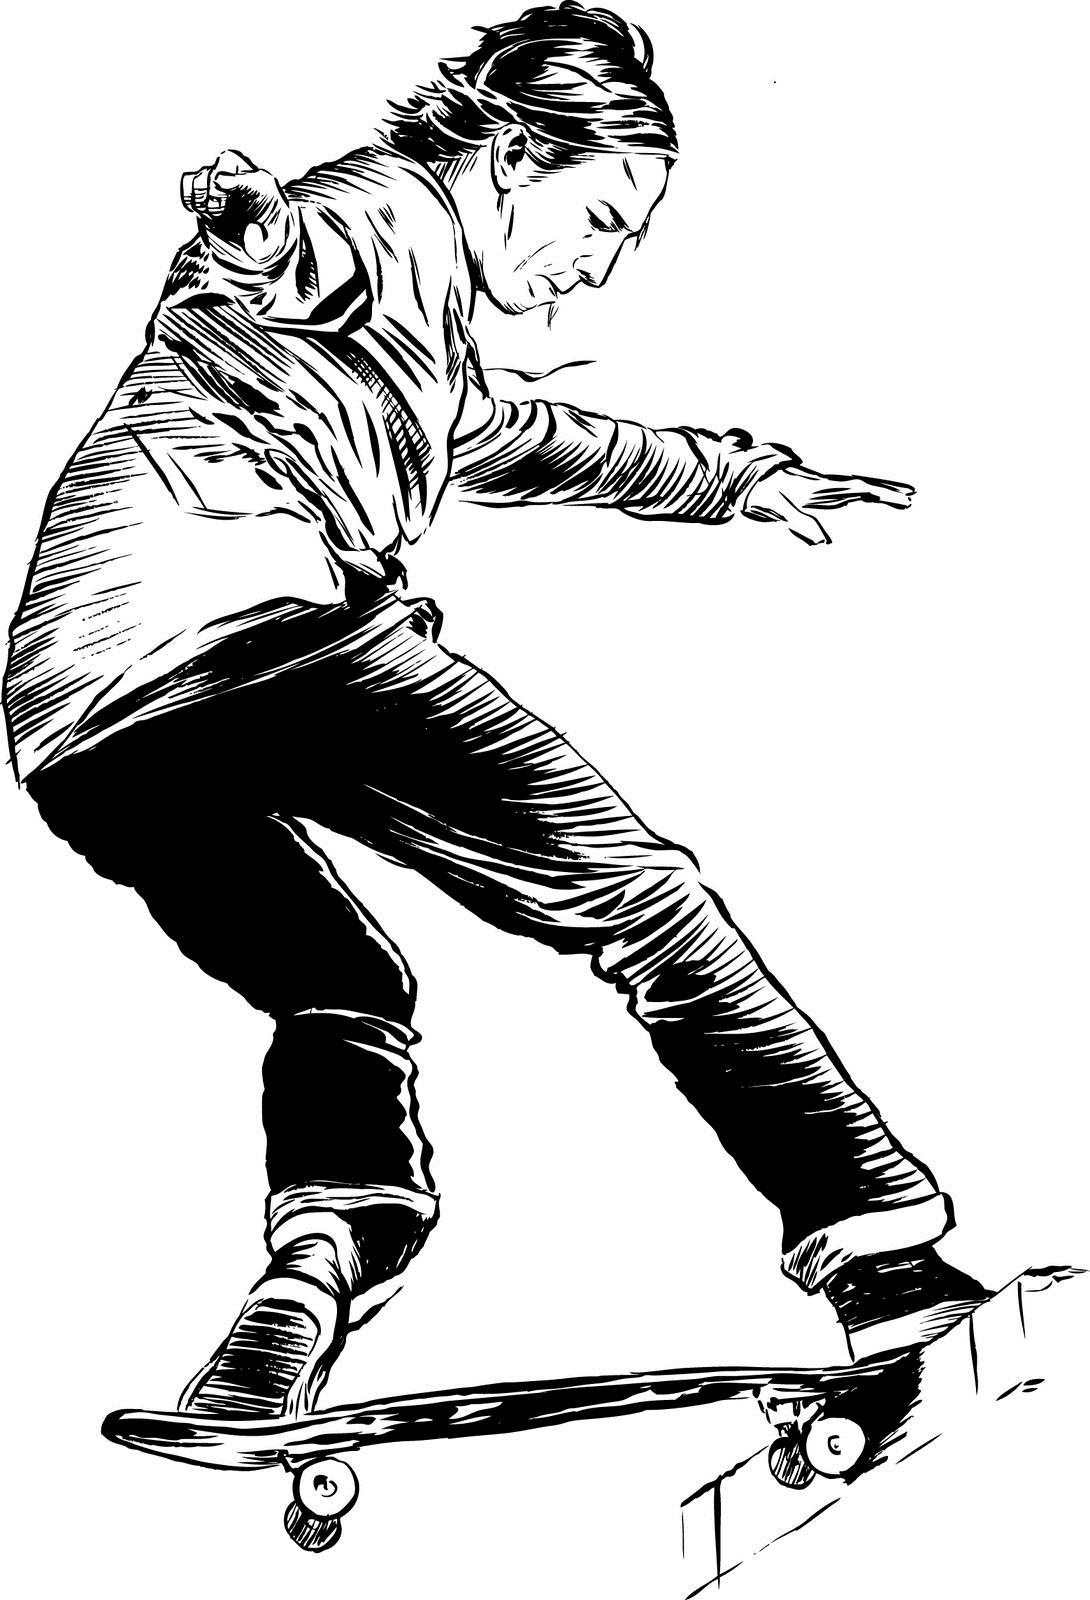 TH s Pro Skater HD E3 Screens & Artwork Revealed